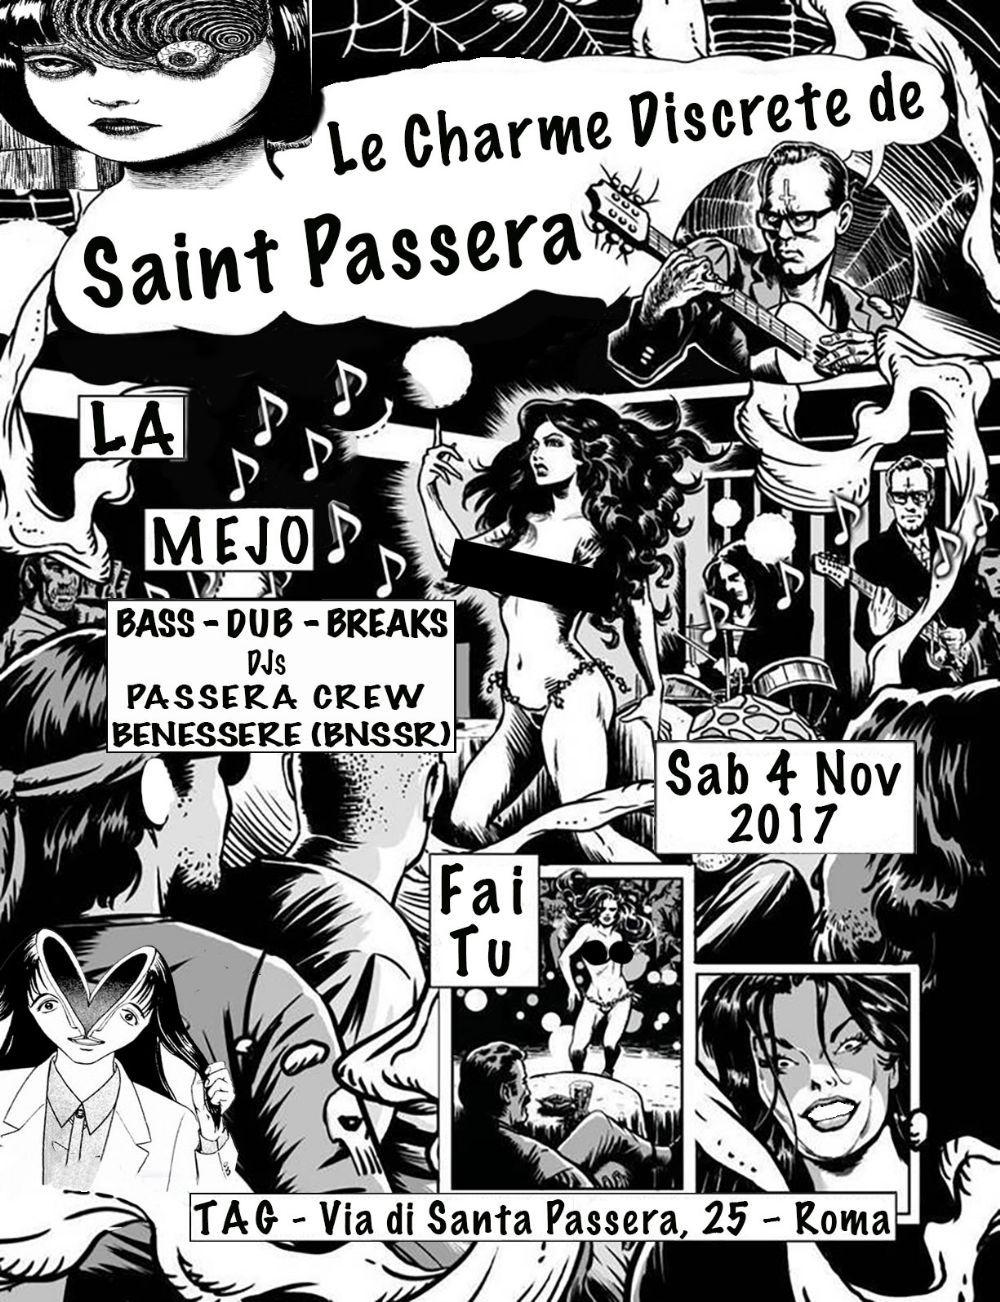 LE CHARME DISCRETE DE SAINT PASSERA